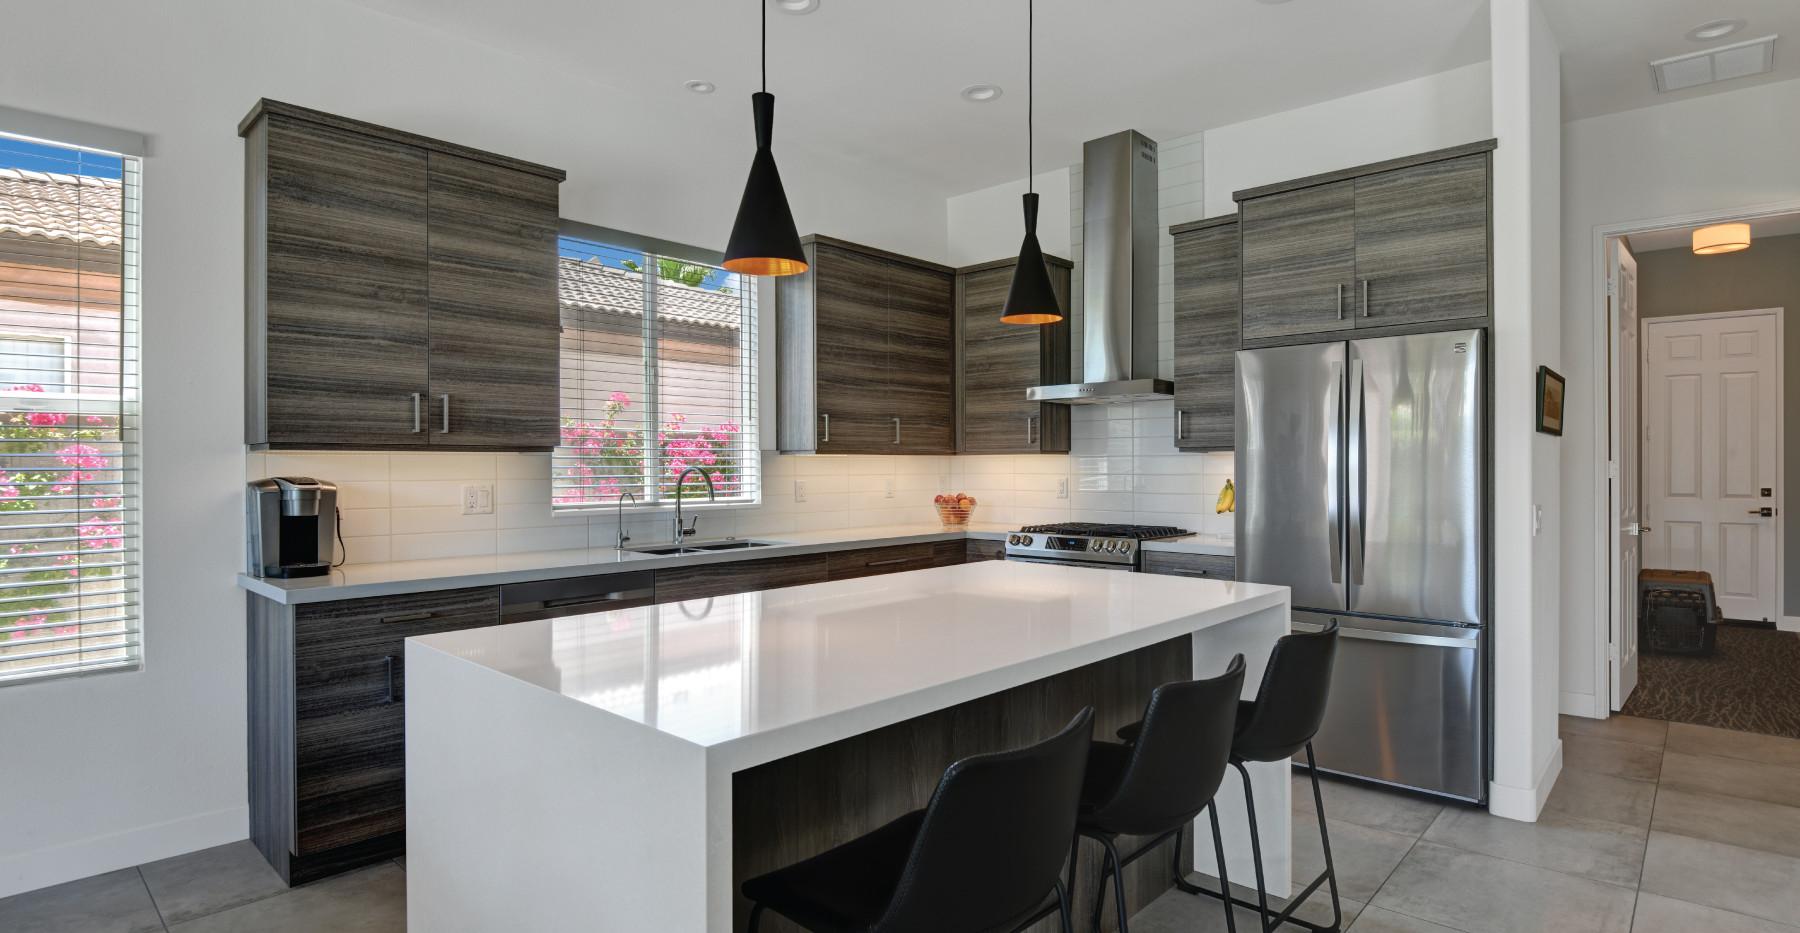 Kitchen-&-Social-Bar-(b).jpg